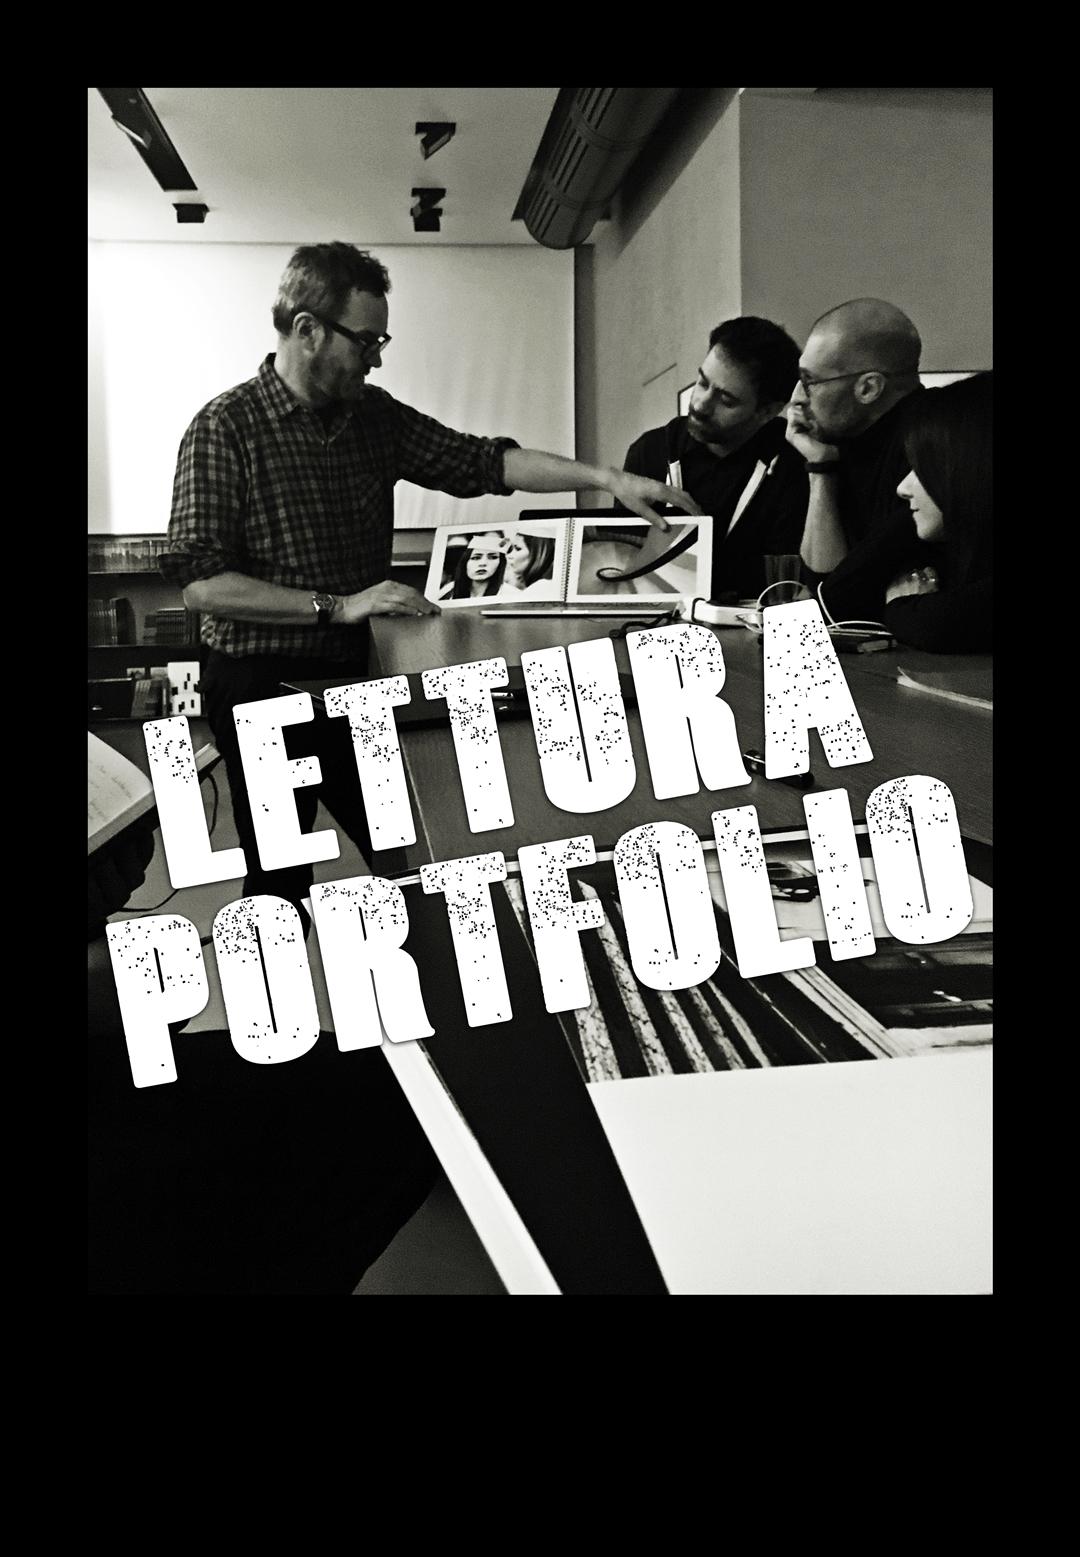 lettura portfolio